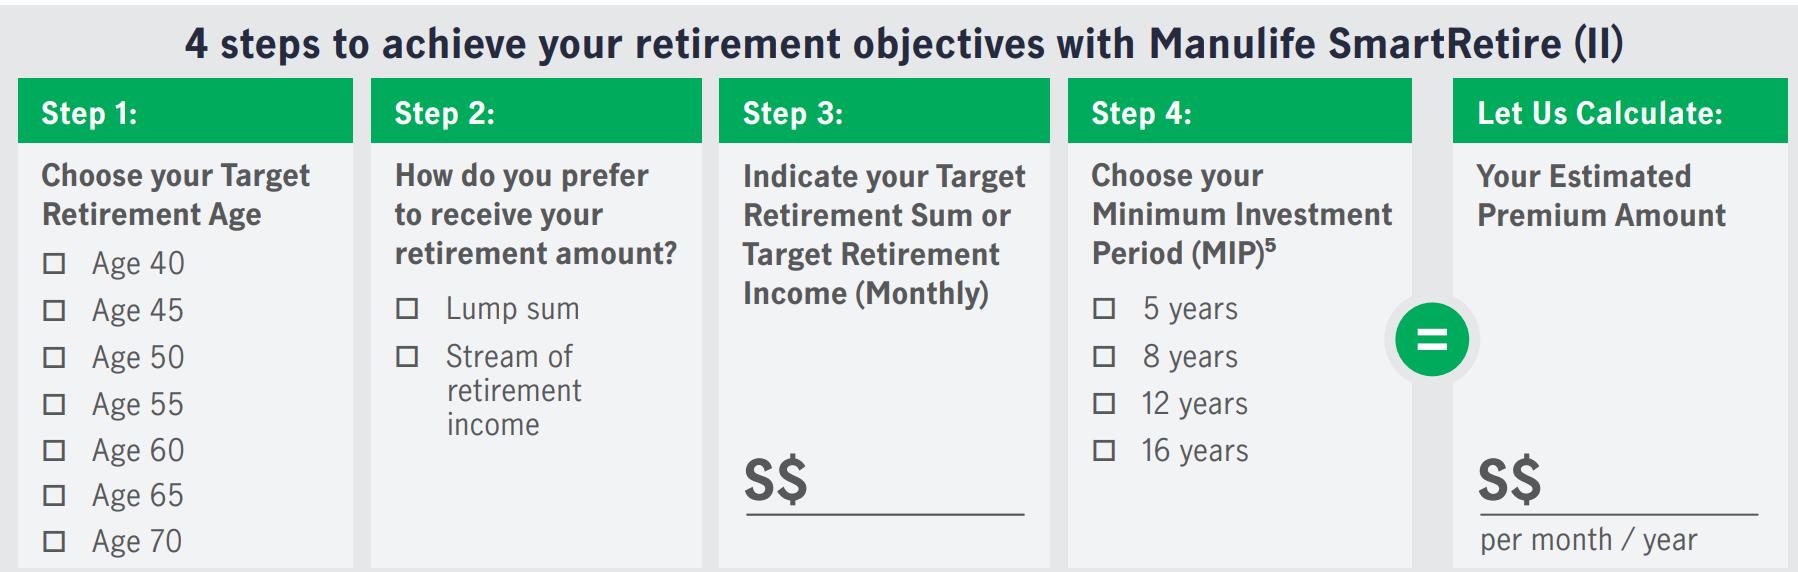 Manulife Smart Retire II